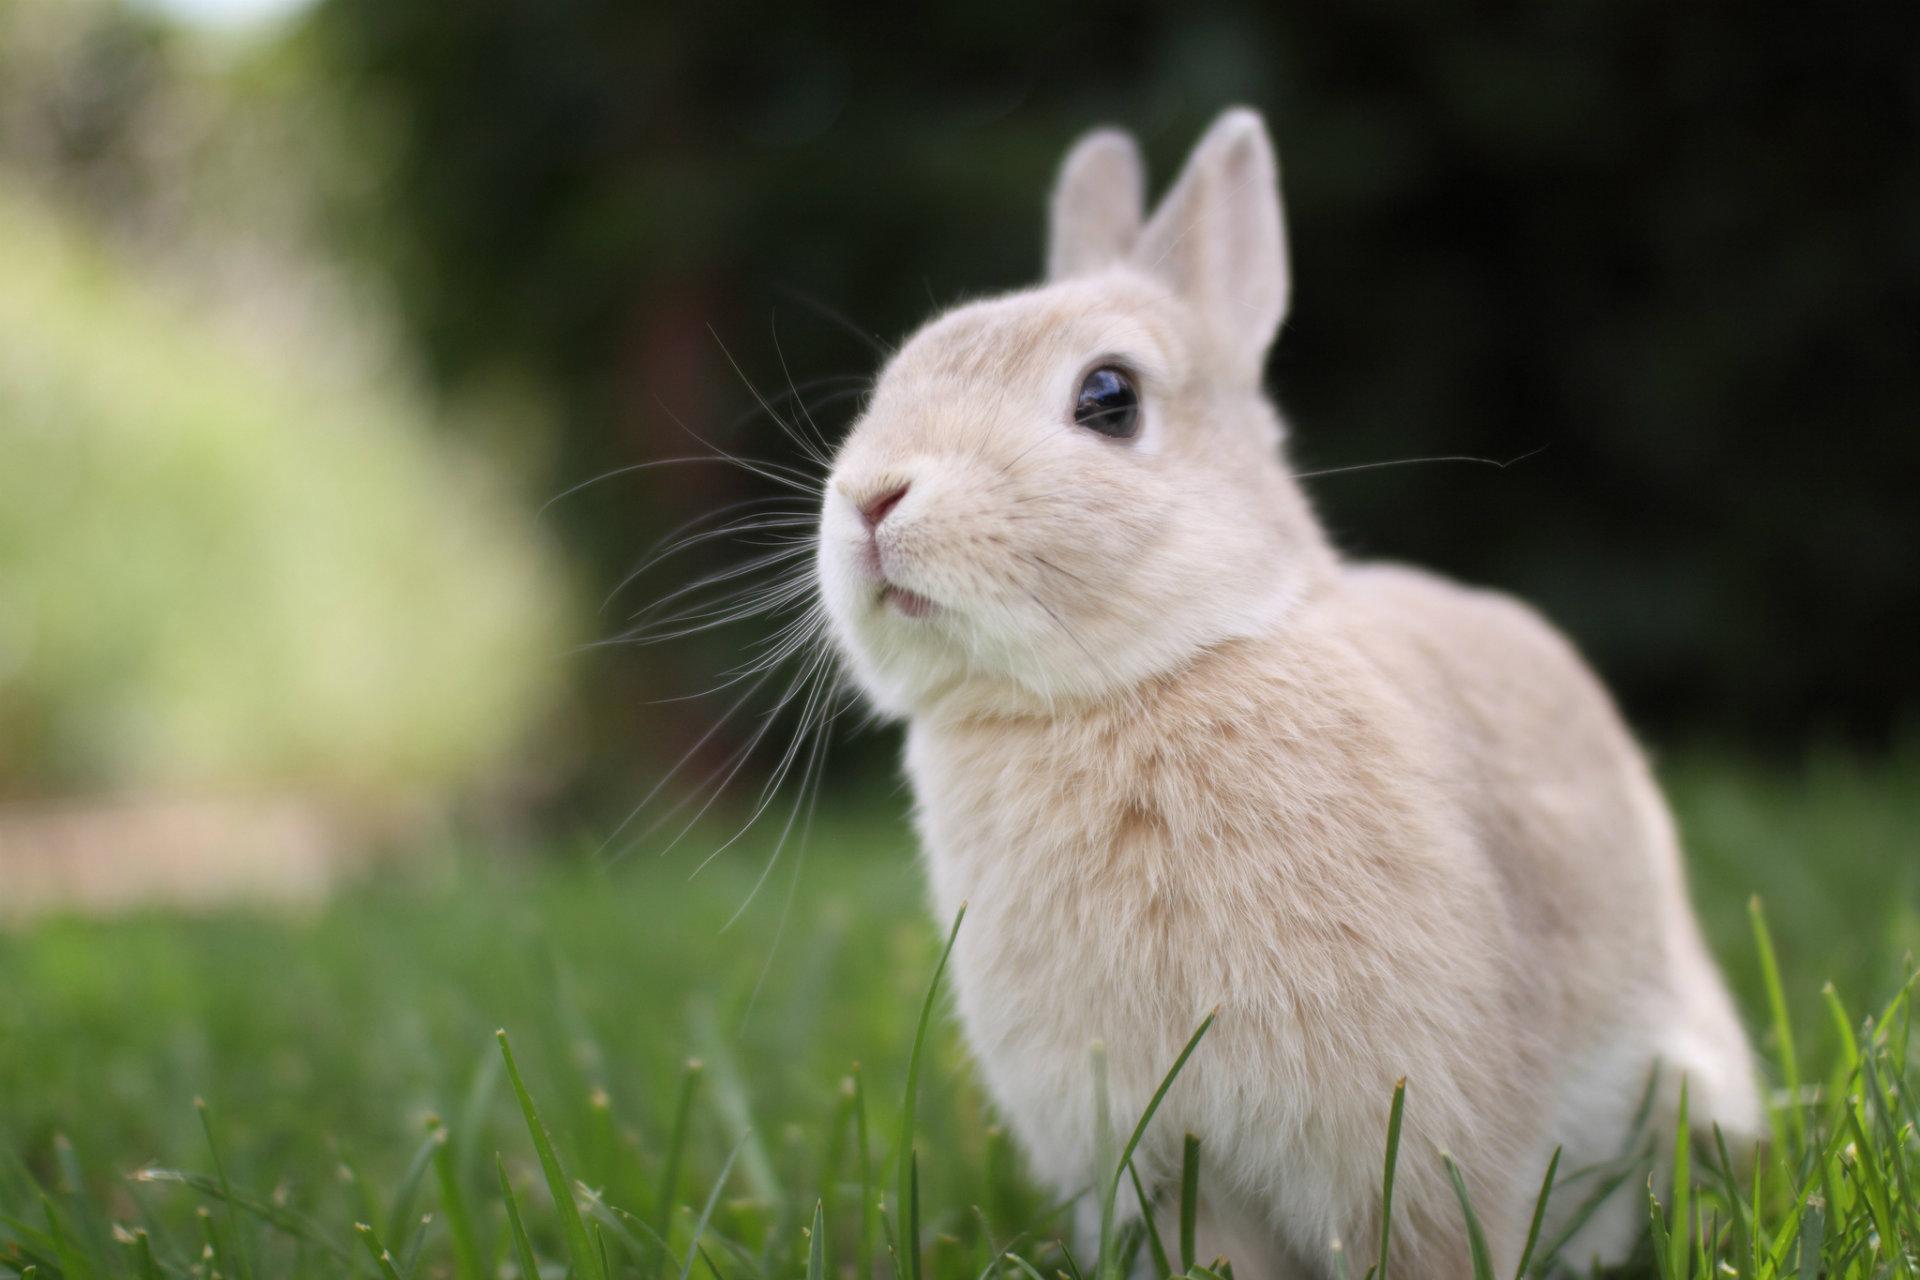 Cute White Rabbit Wallpapers For Desktop: Cute Bunny Wallpaper